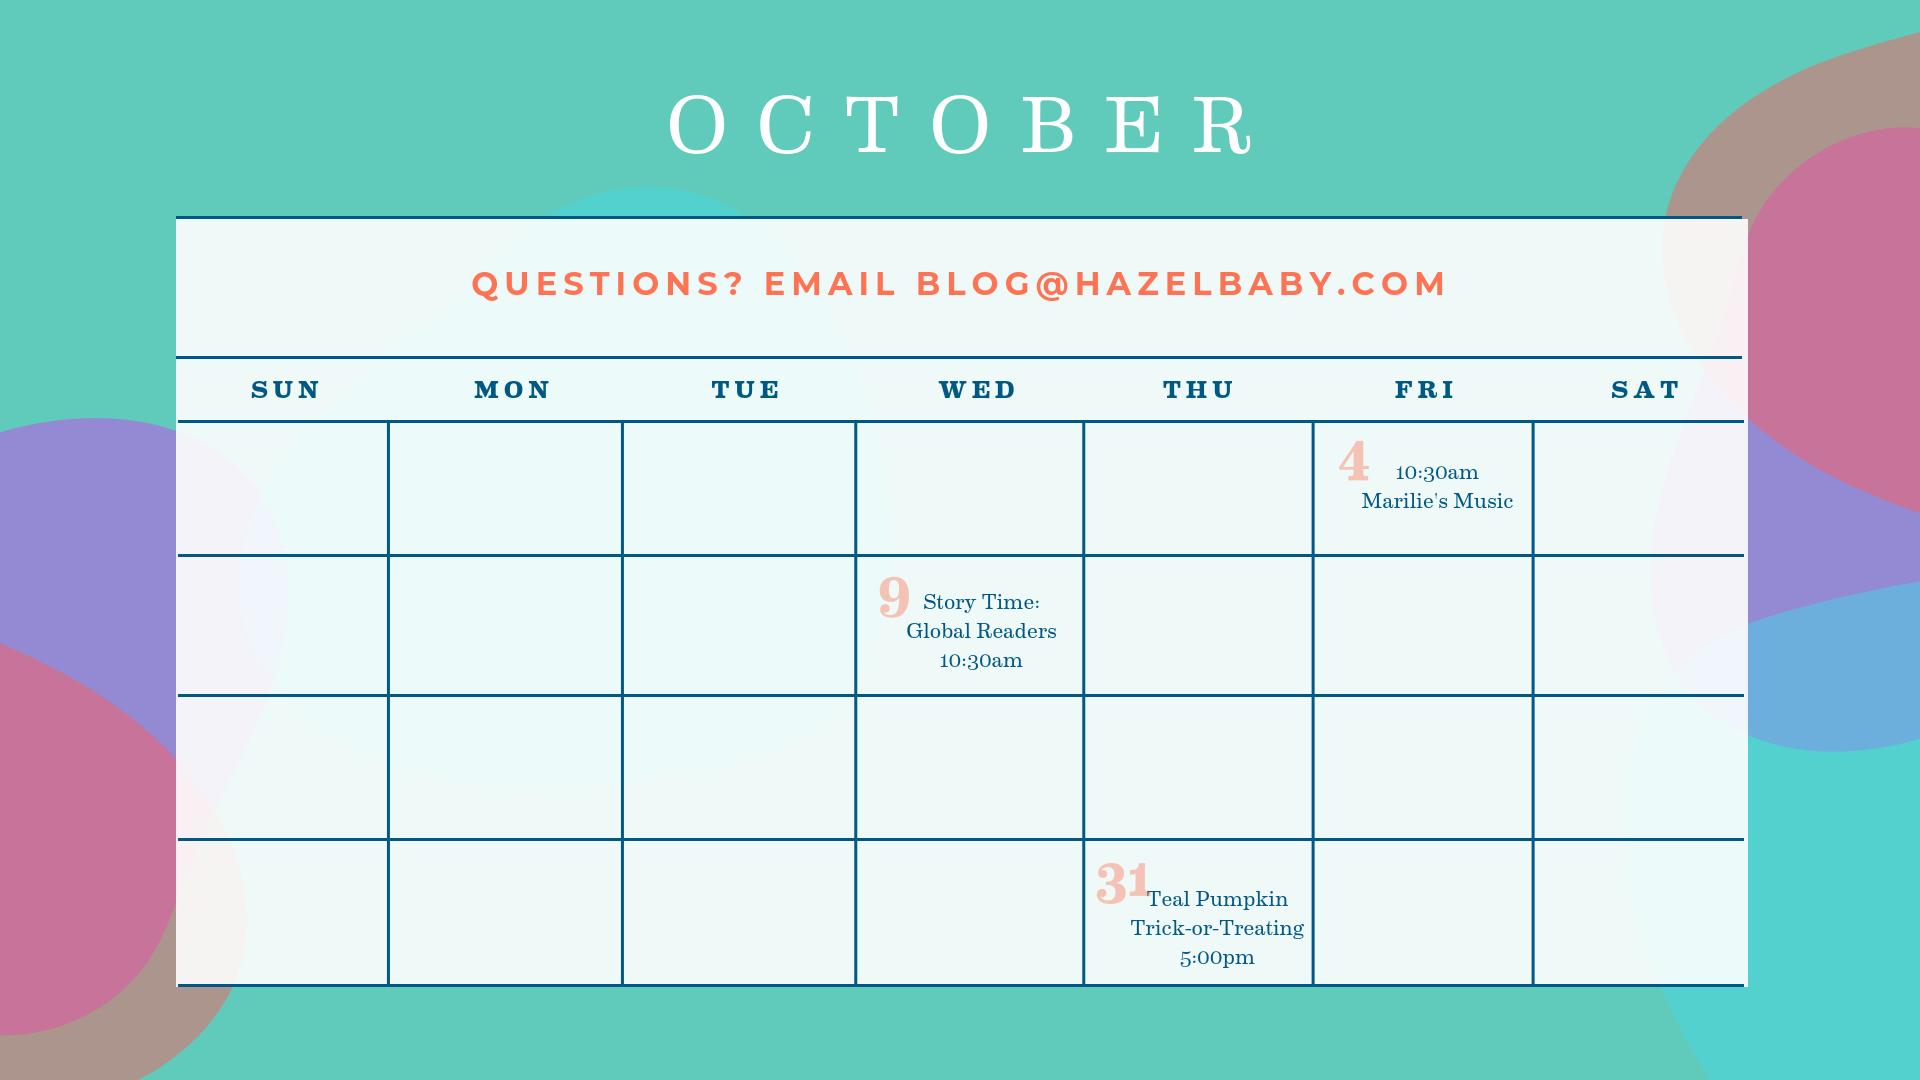 October Jersey city calendar of events